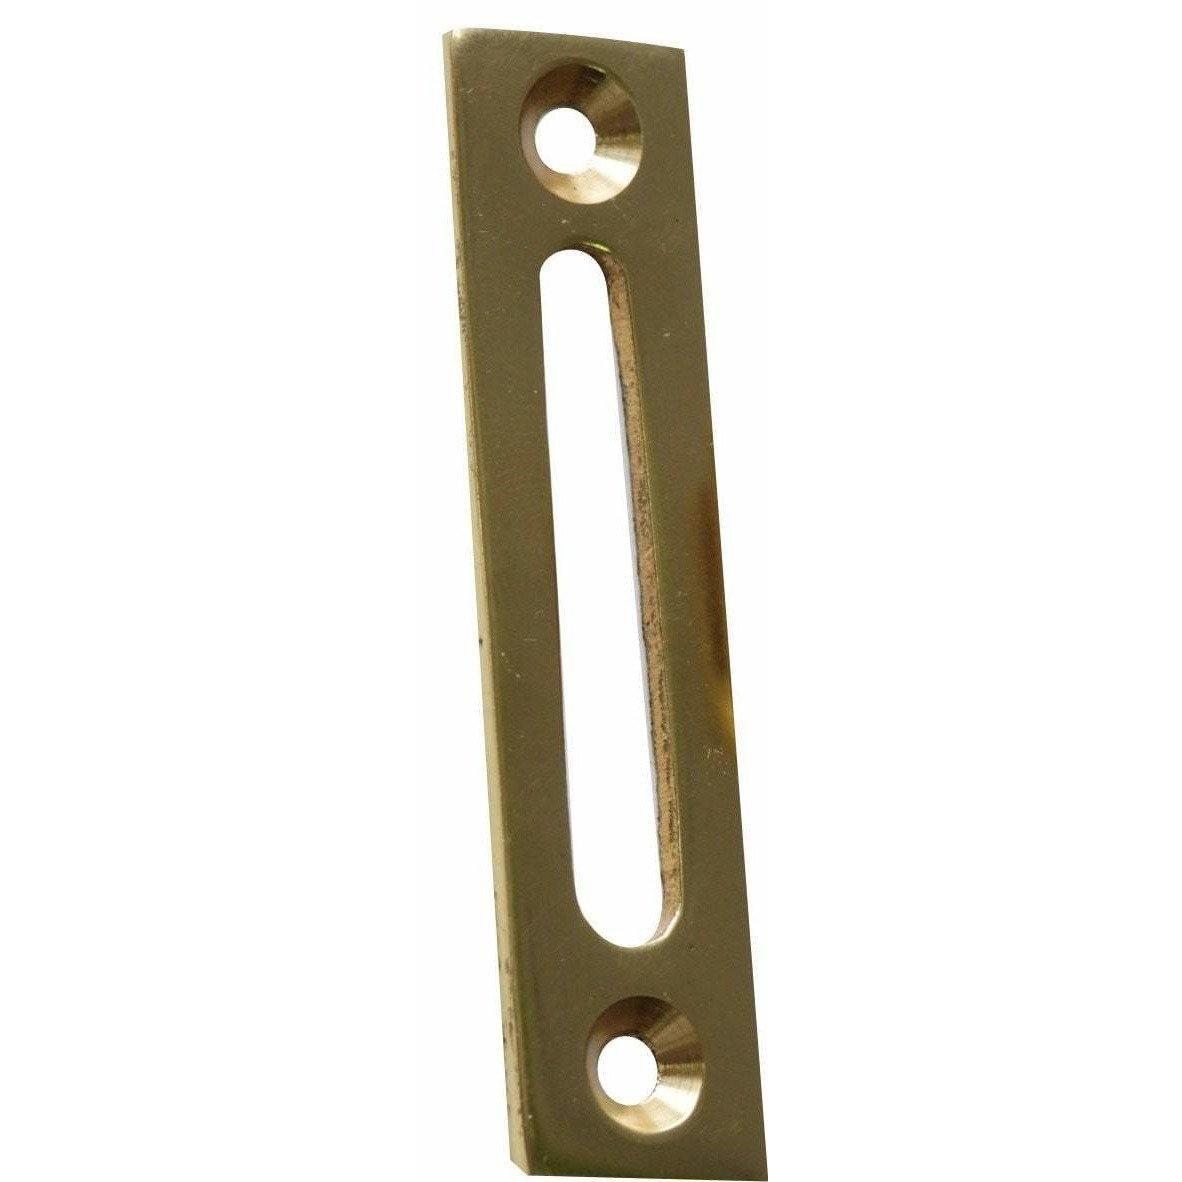 Solid brass striker for wooden window handles